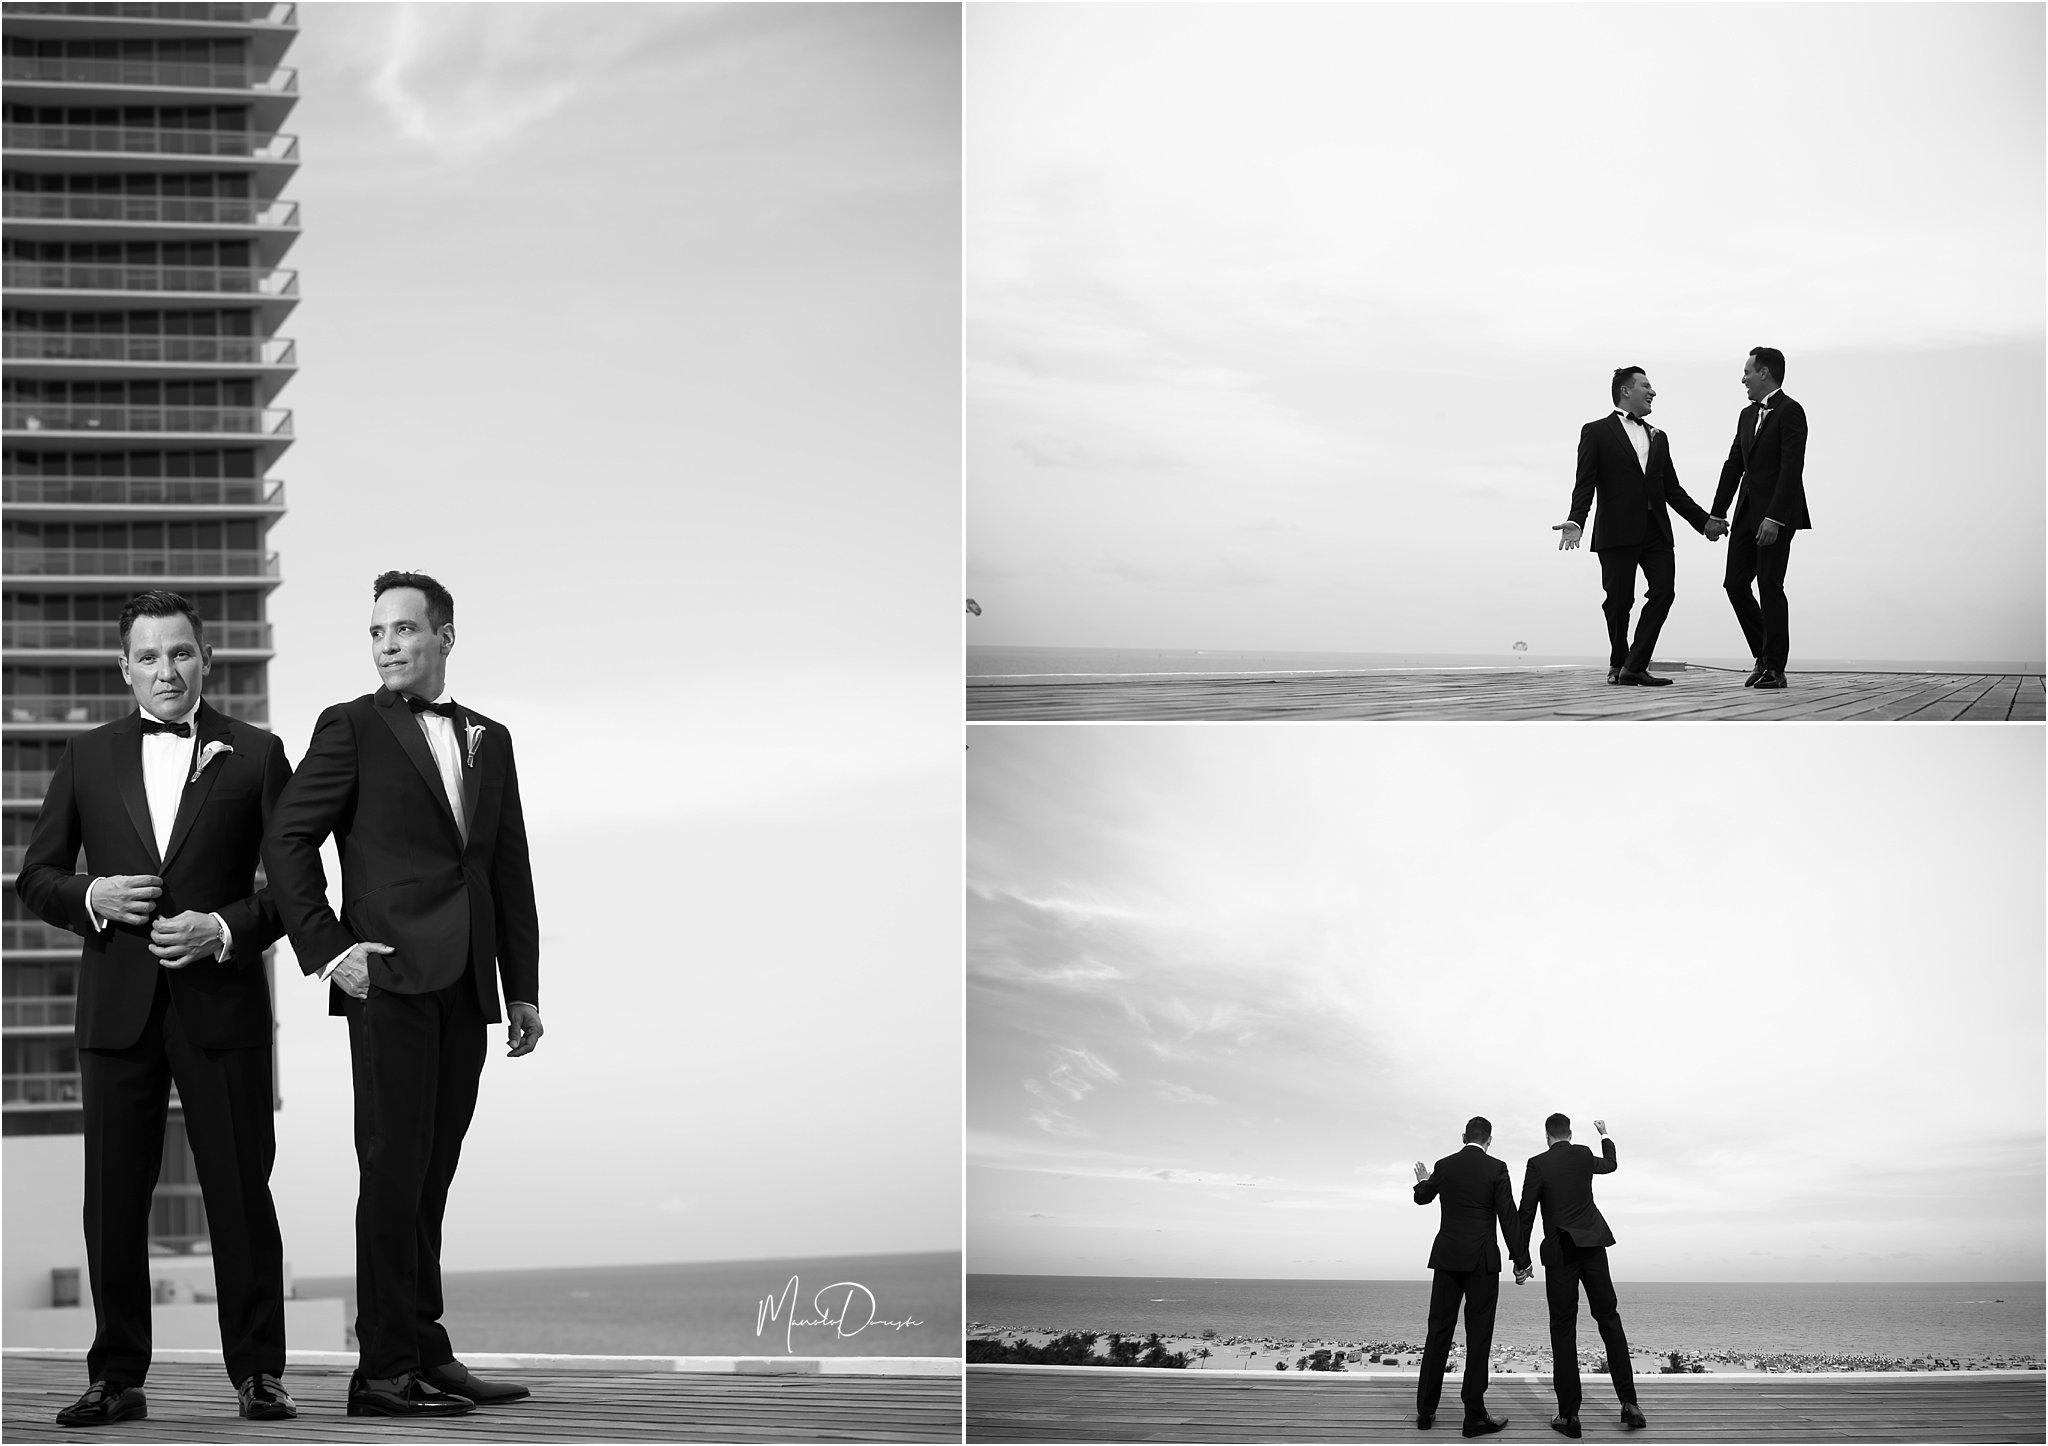 0189_ManoloDoreste_InFocusStudios_Wedding_Family_Photography_Miami_MiamiPhotographer.jpg